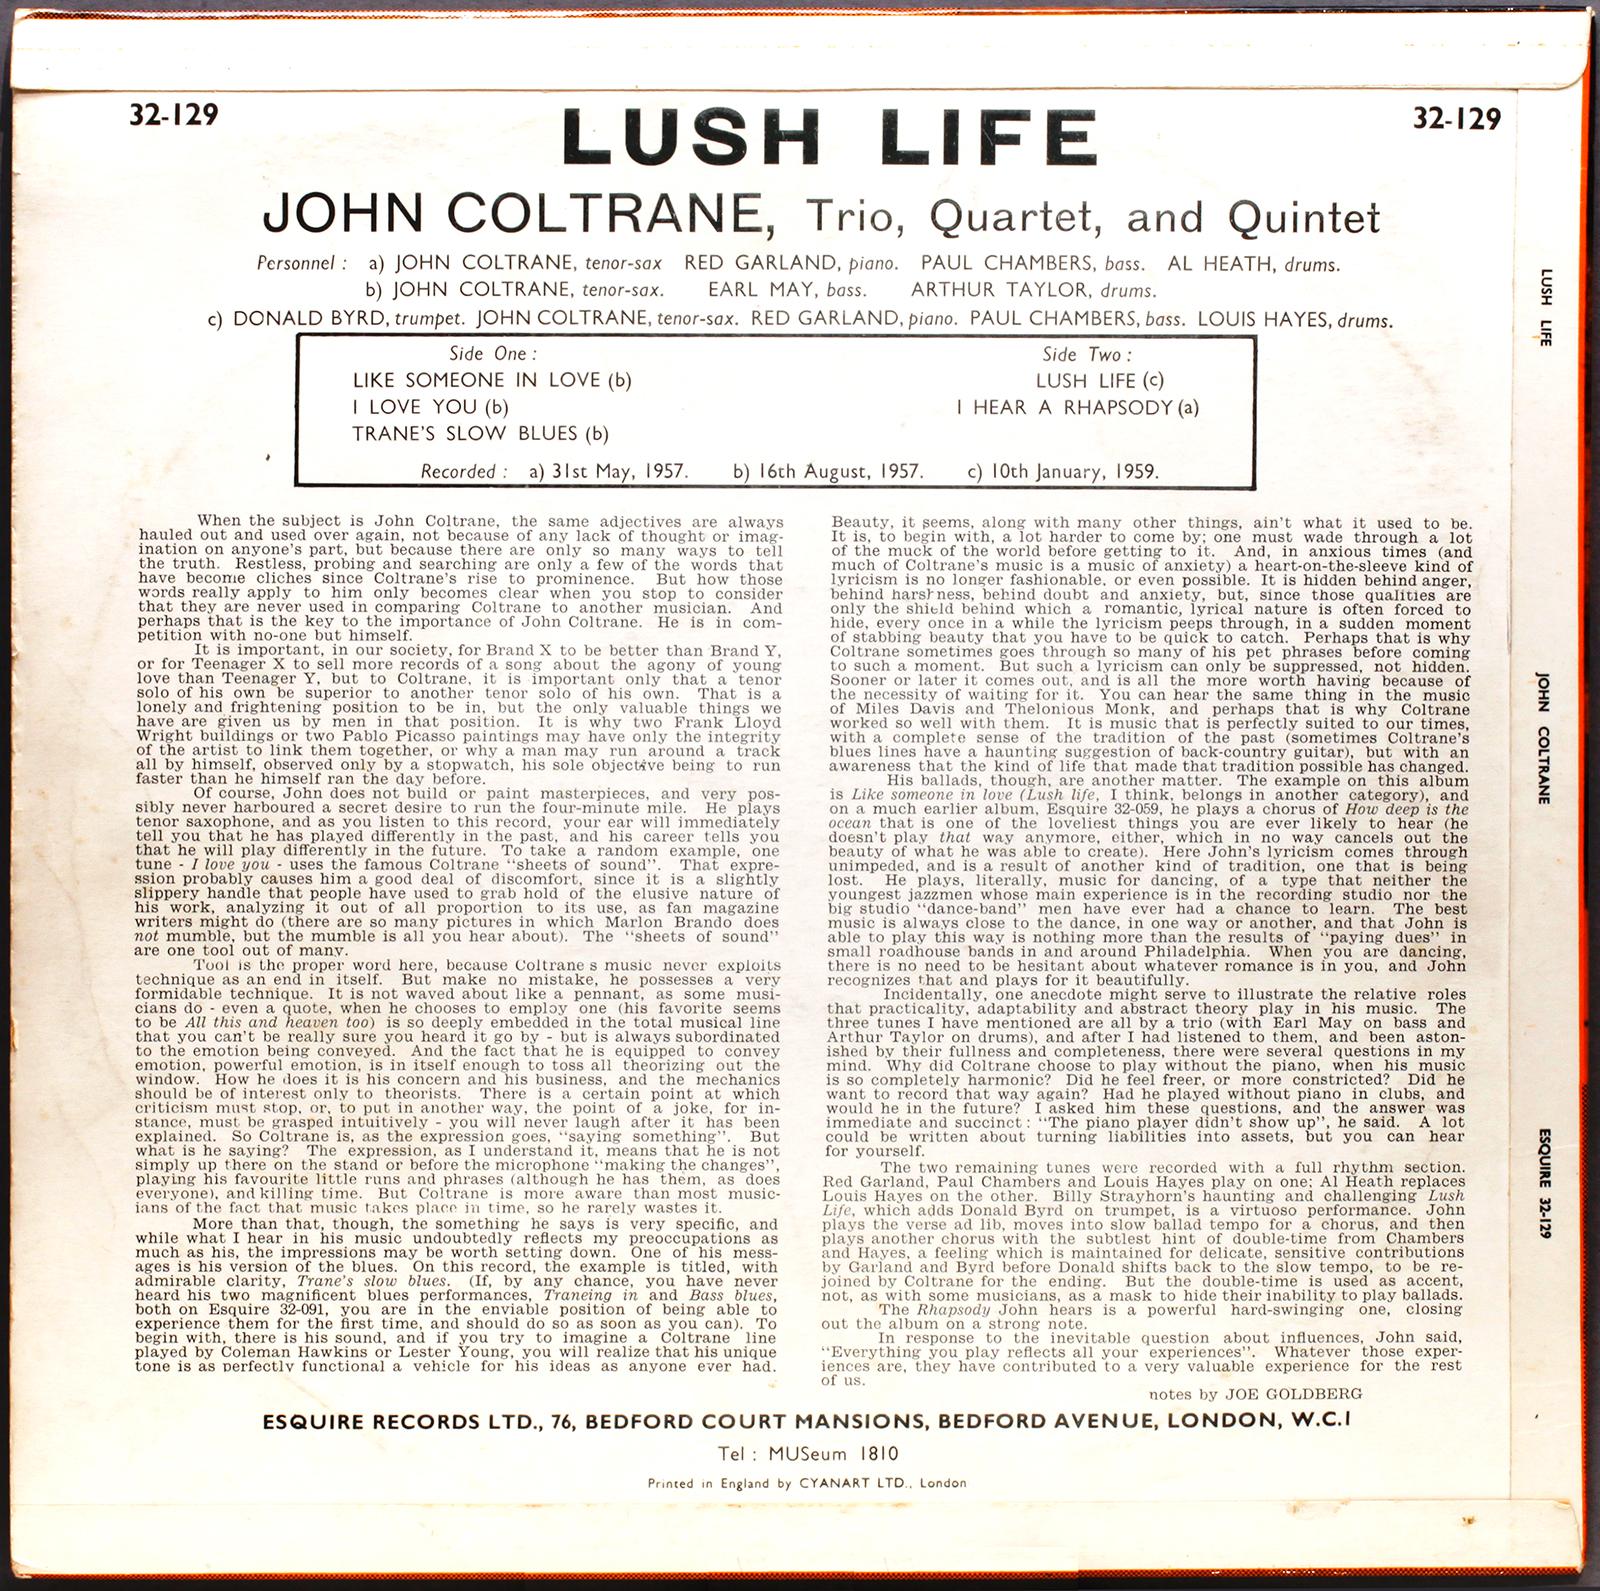 John Coltrane Lush Life 1958 Esquire Londonjazzcollector